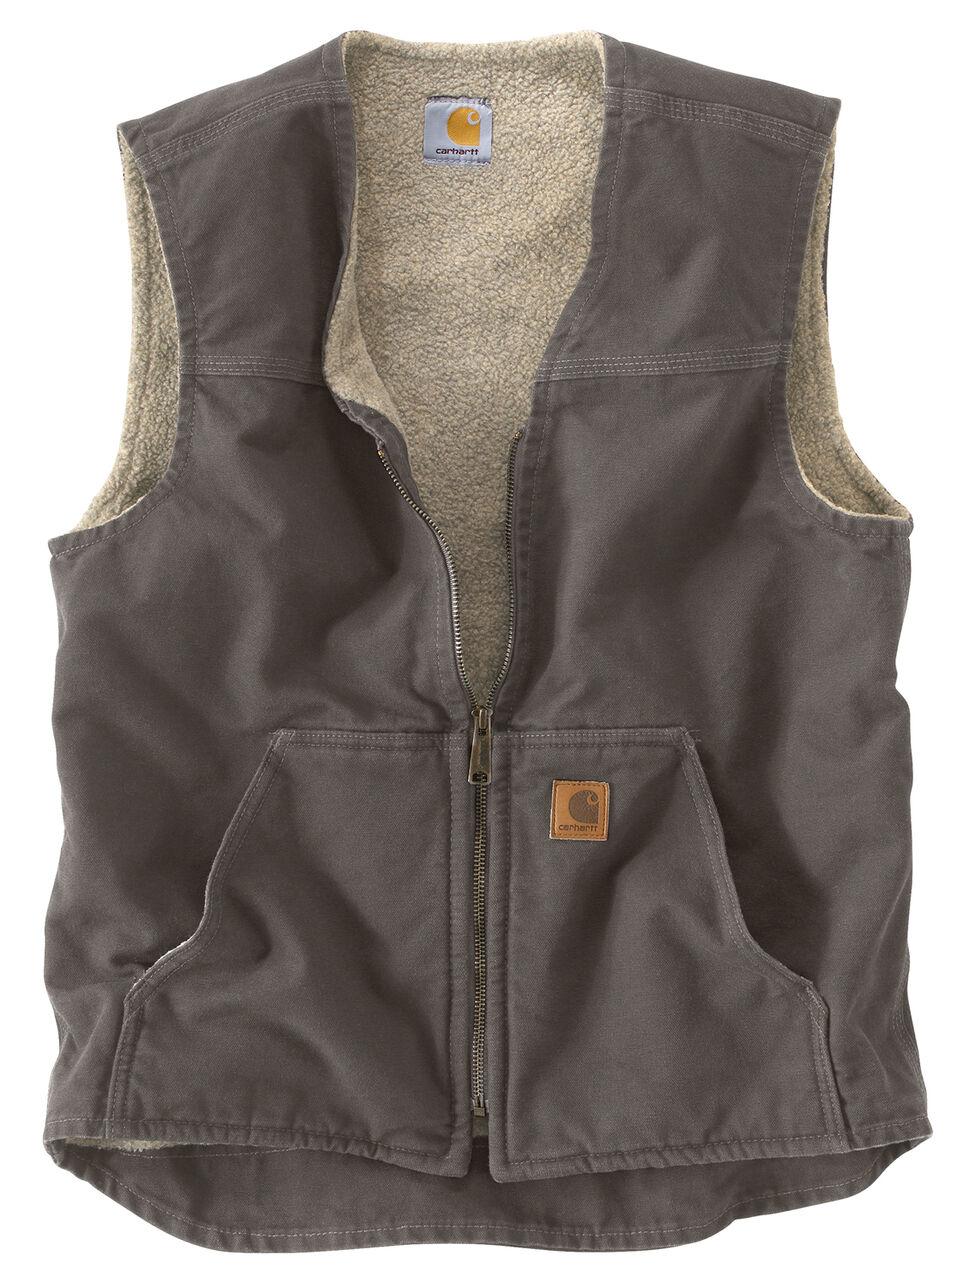 Carhartt Rugged Work Vest - Big & Tall, Grey, hi-res